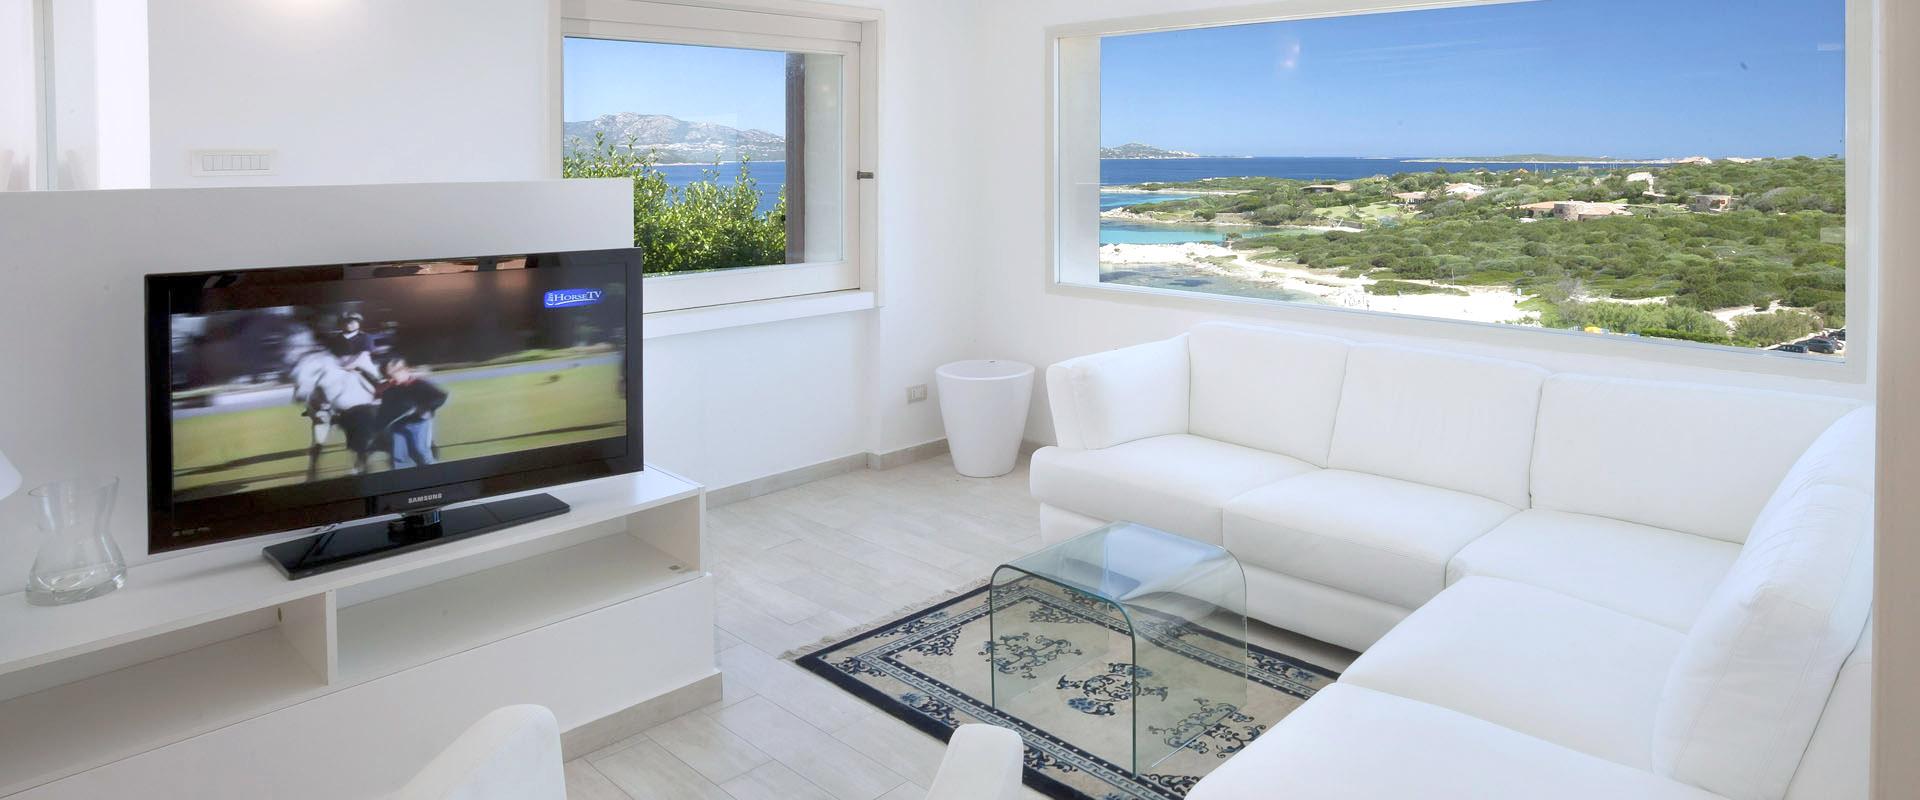 Luxury-Villa-WhiteBEach-Portorotondo-Sardinia-Rent7